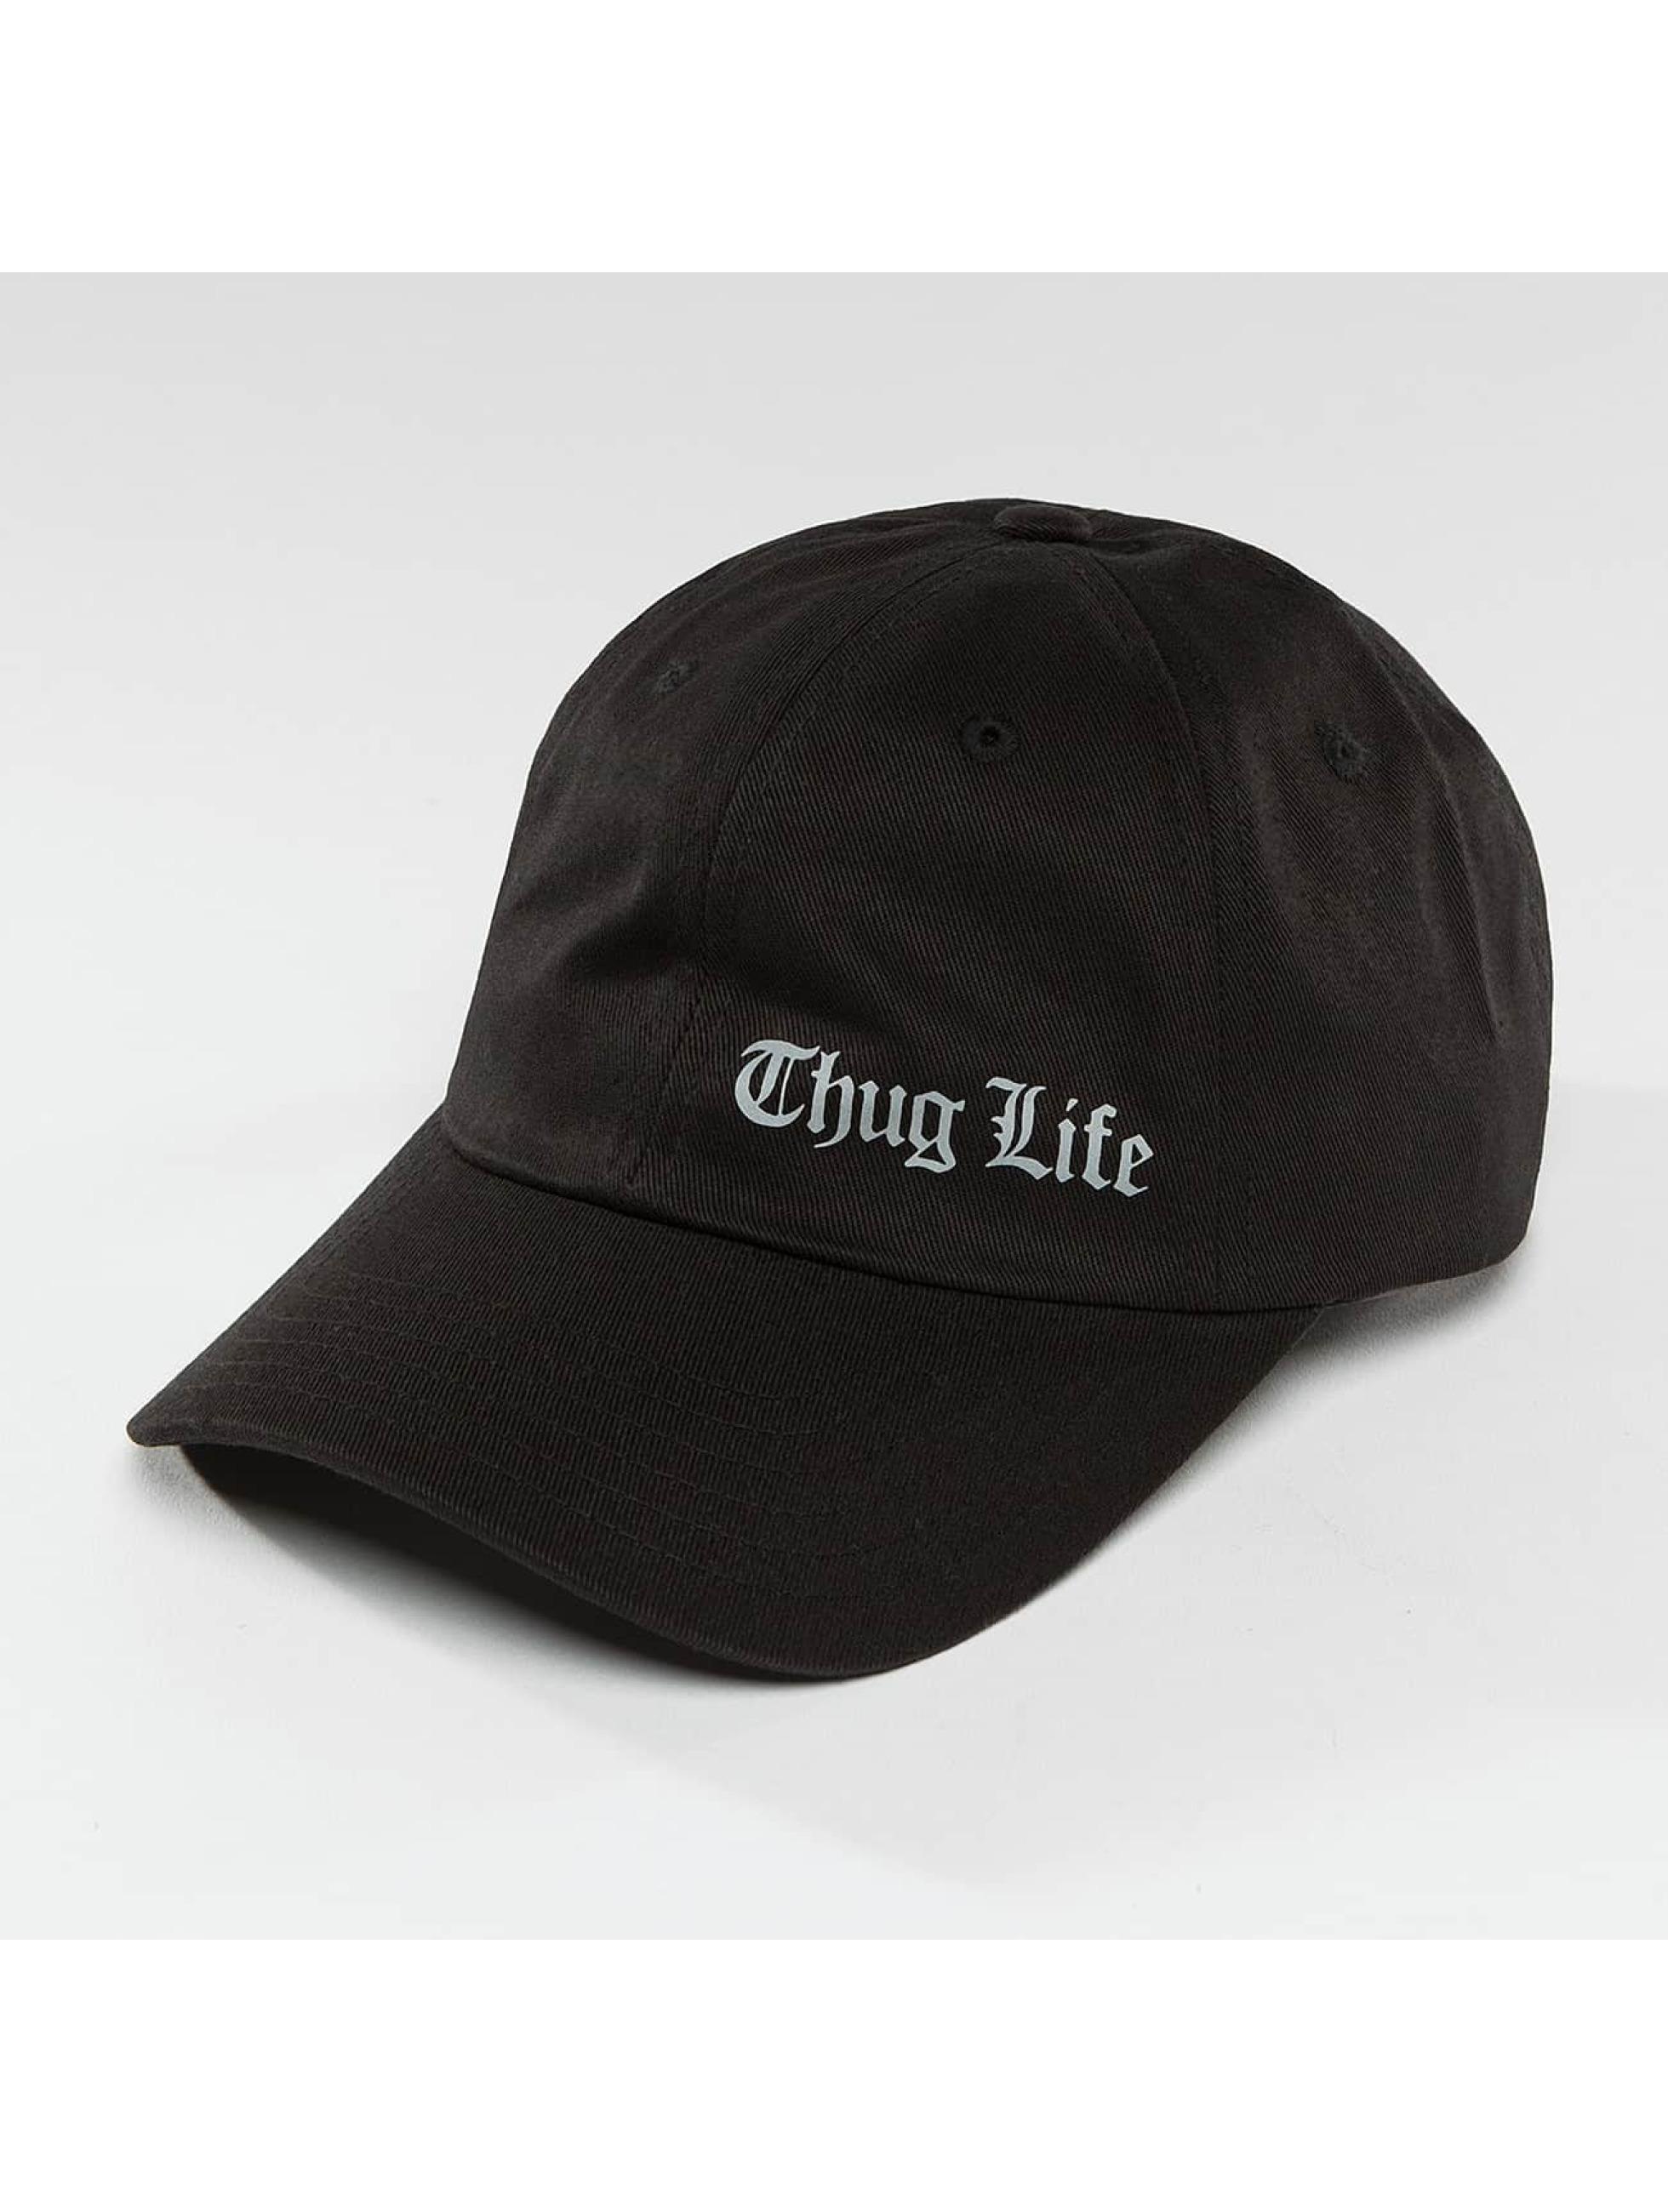 Thug Life / Snapback Cap Curved in black Adjustable